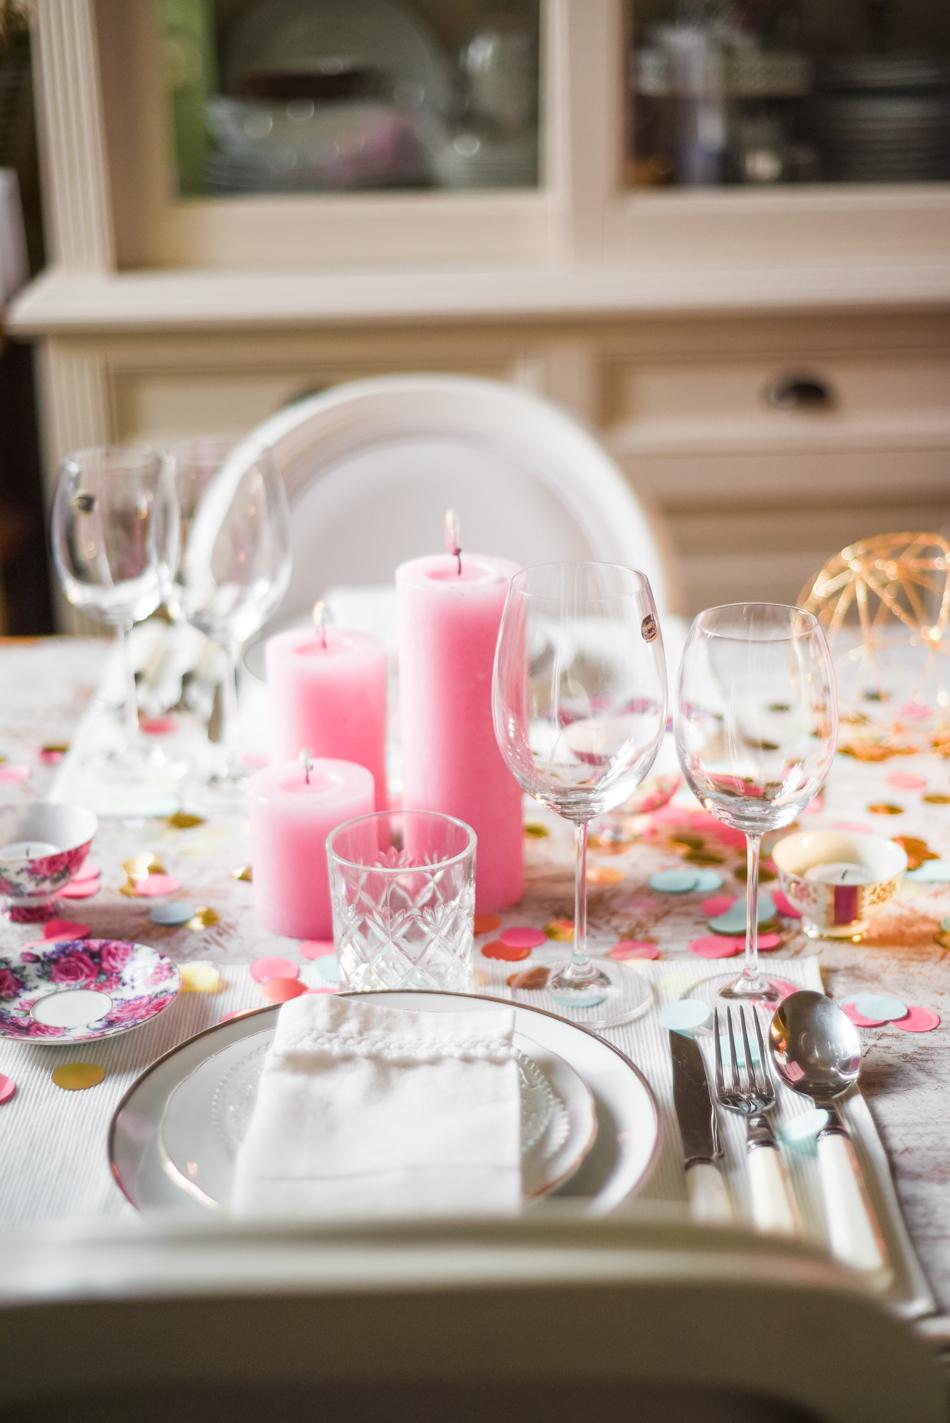 Valentinesday-table-setting-decor-styling-AnaisStoelen-13.jpg